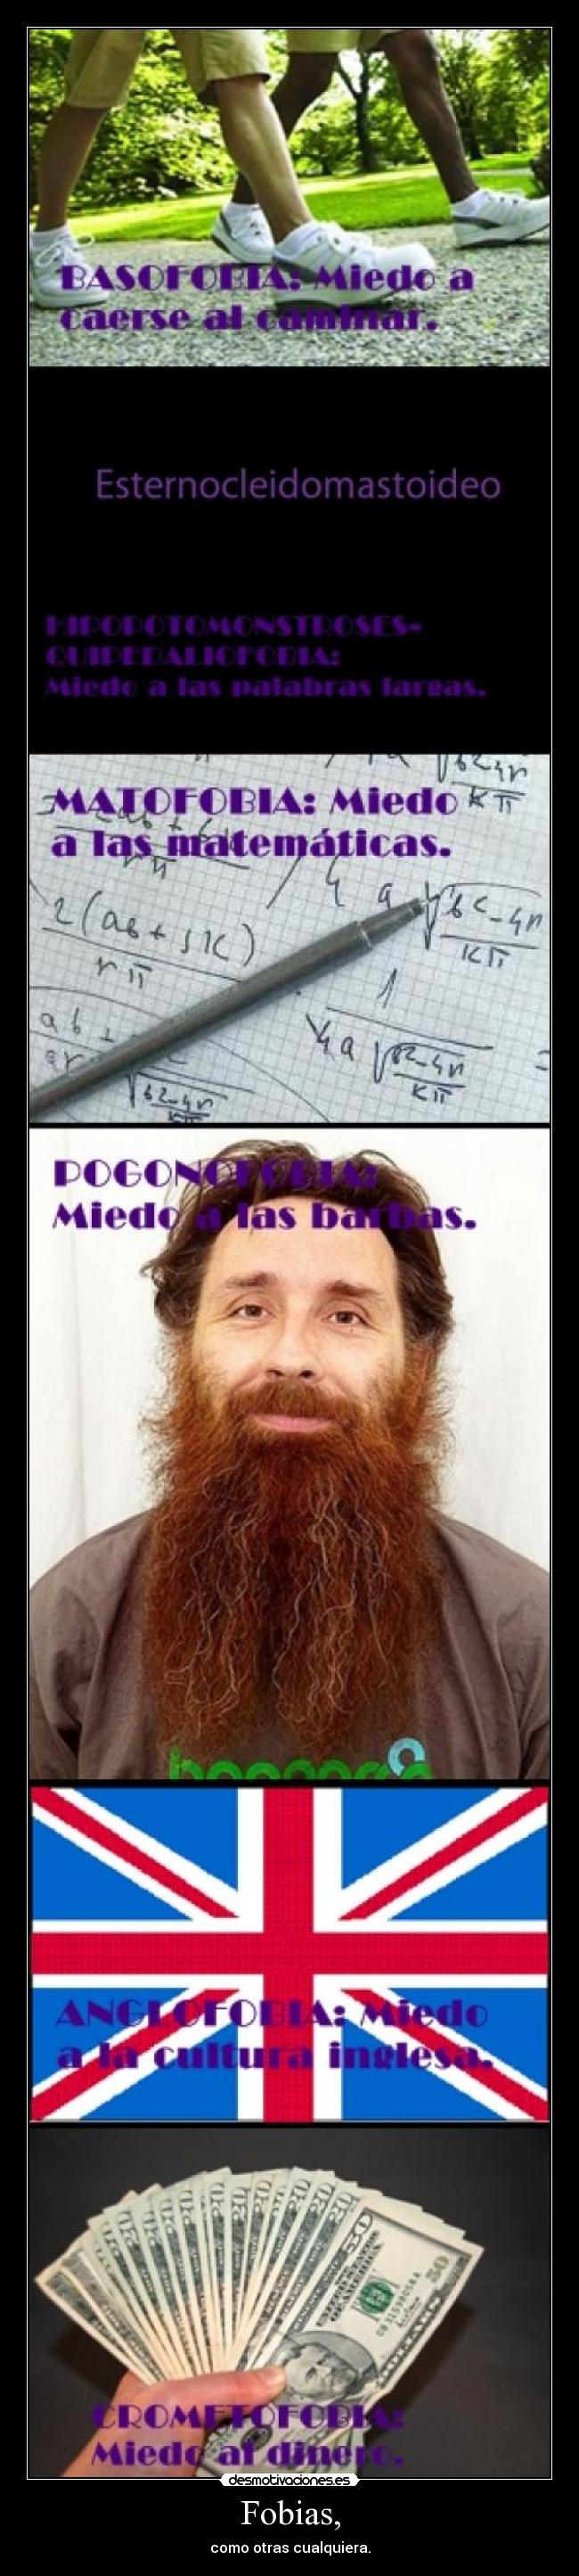 carteles fobias barba dinero caminar caerse ingles matematicas instituto desmotivaciones